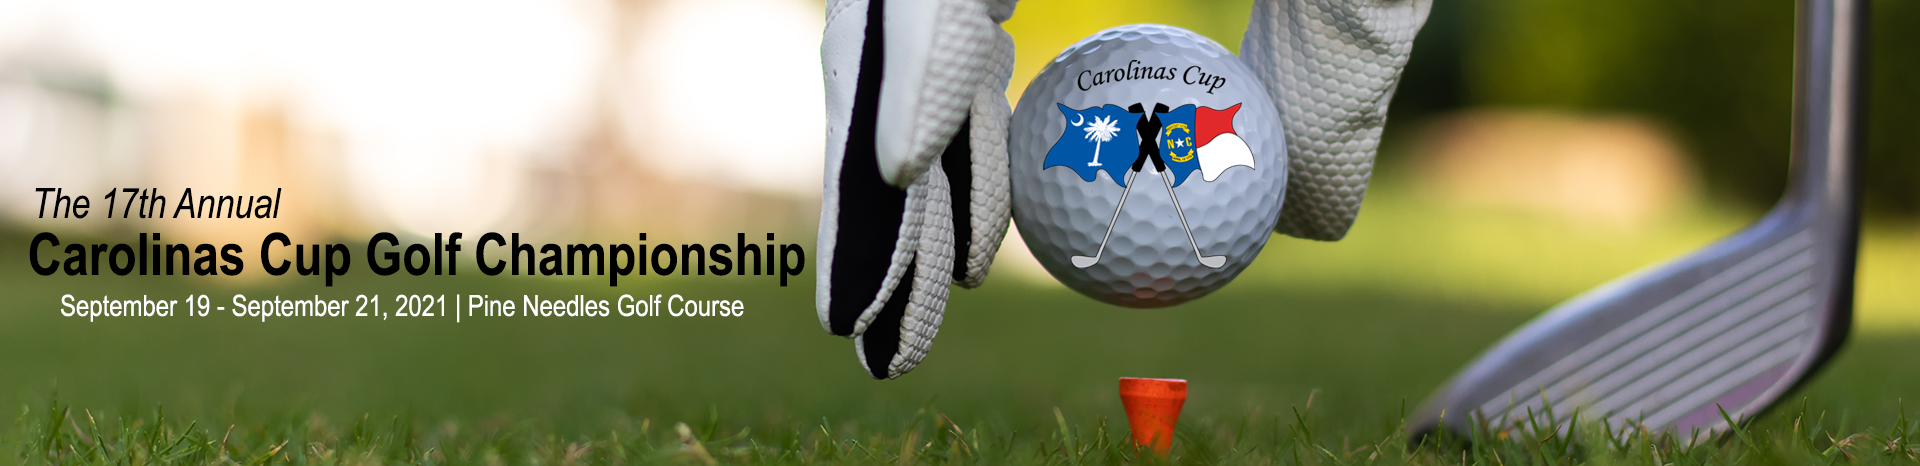 CUNA Mutual 17th Annual Carolinas Cup Championship